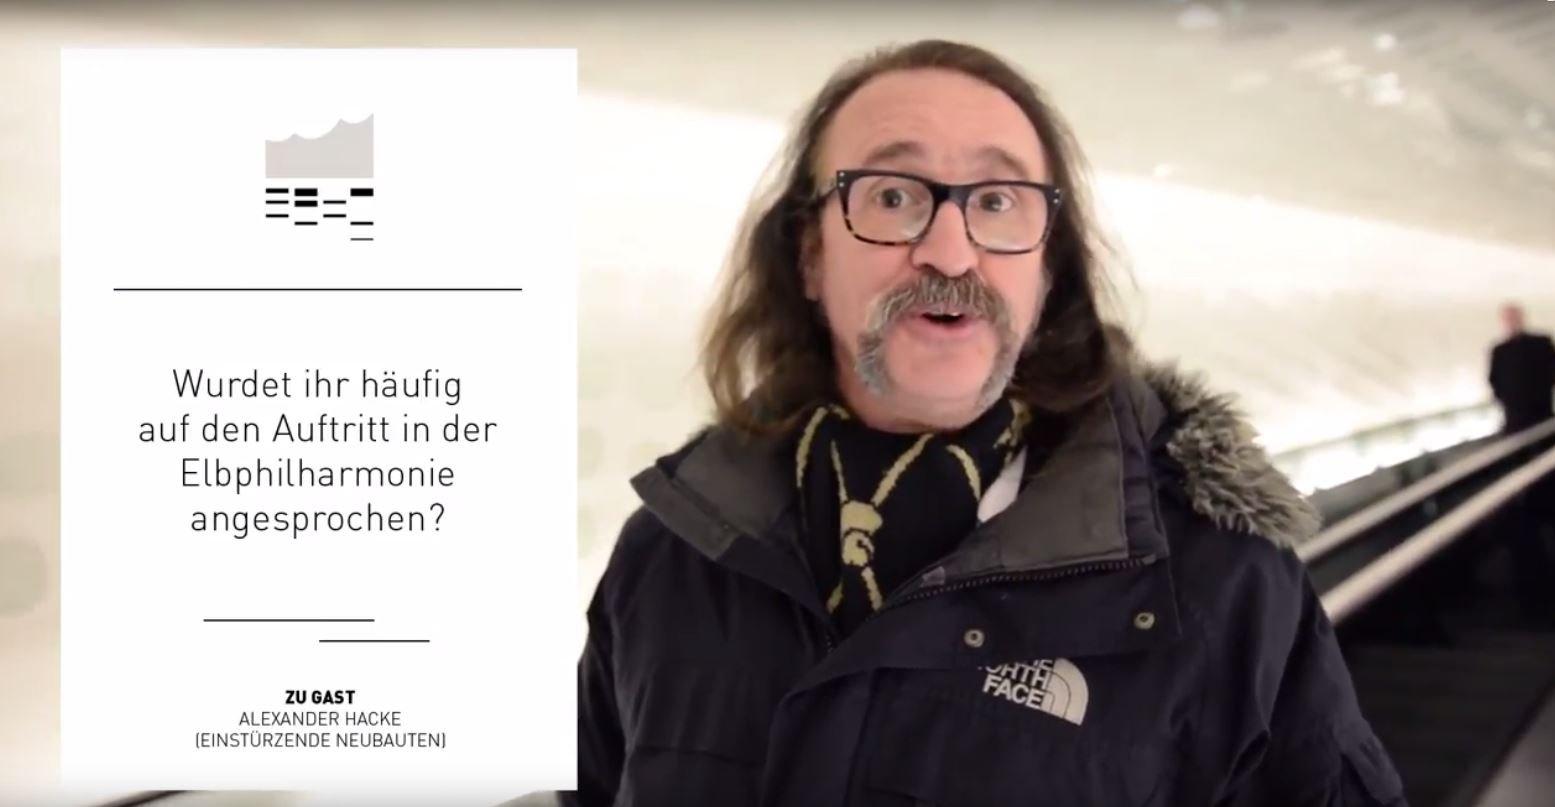 Tube Talk with Alexander Hacke